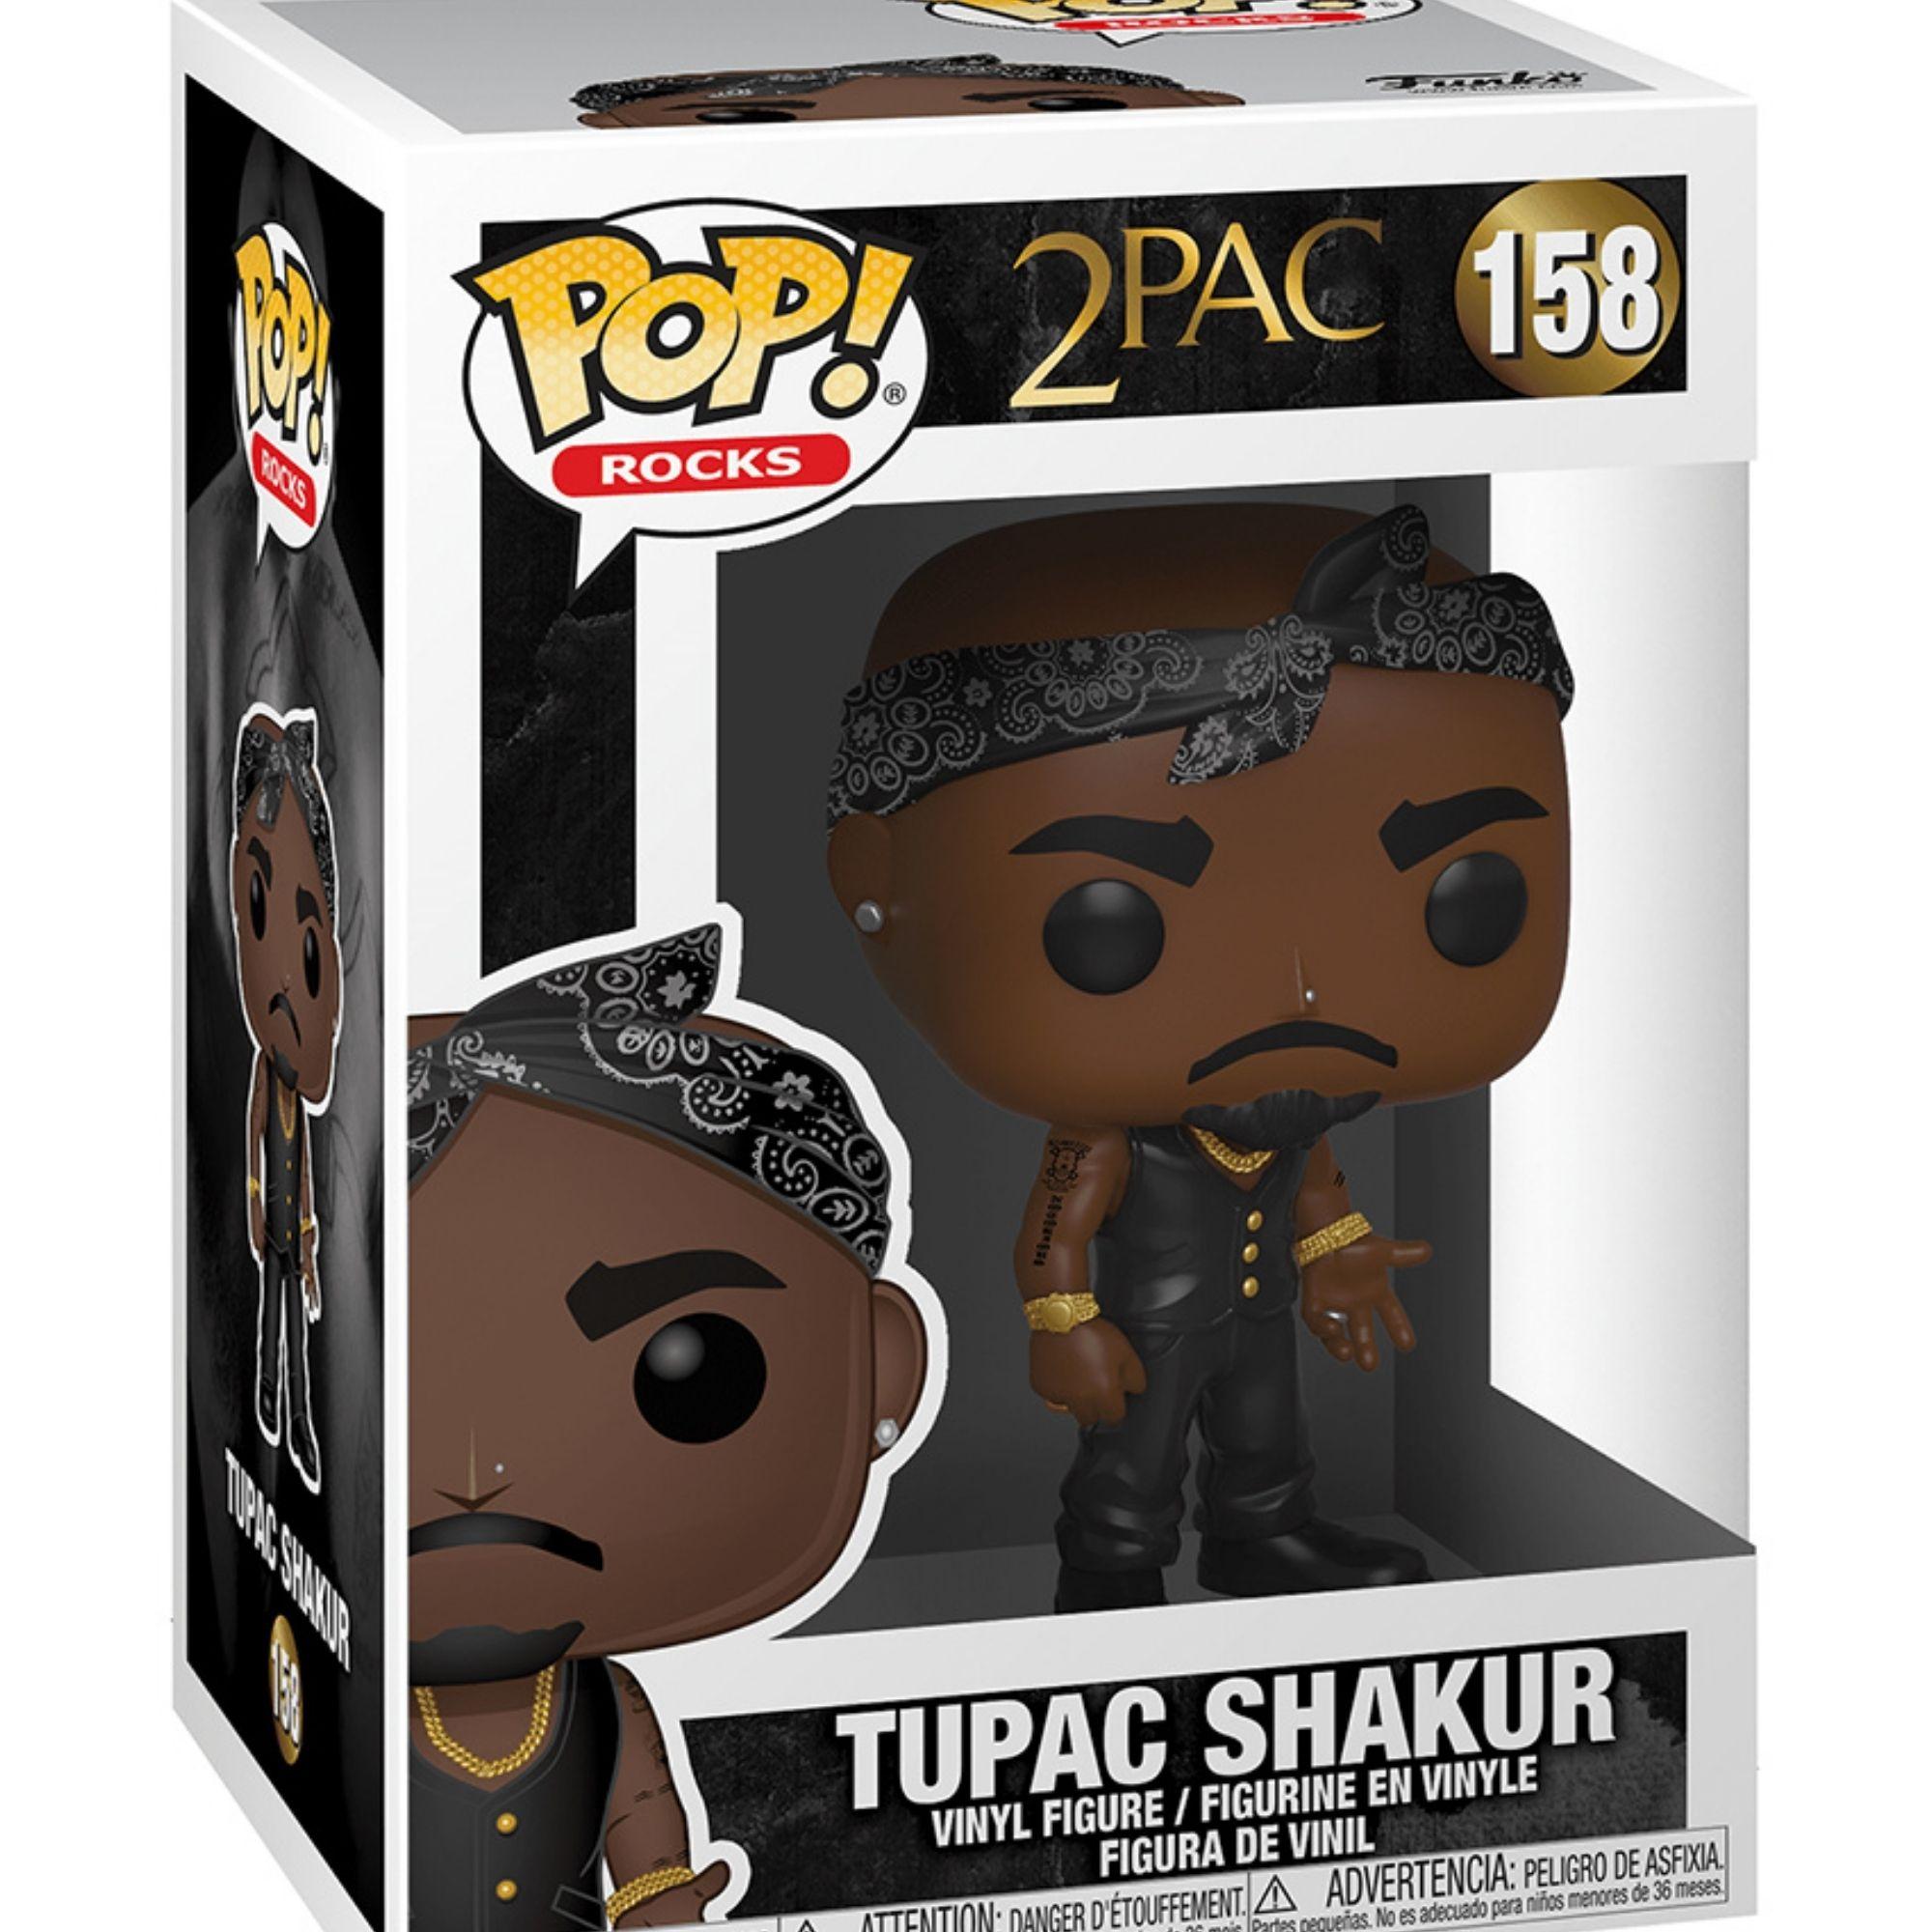 Funko Pop Rocks Tupac Shakur #158  - Game Land Brinquedos